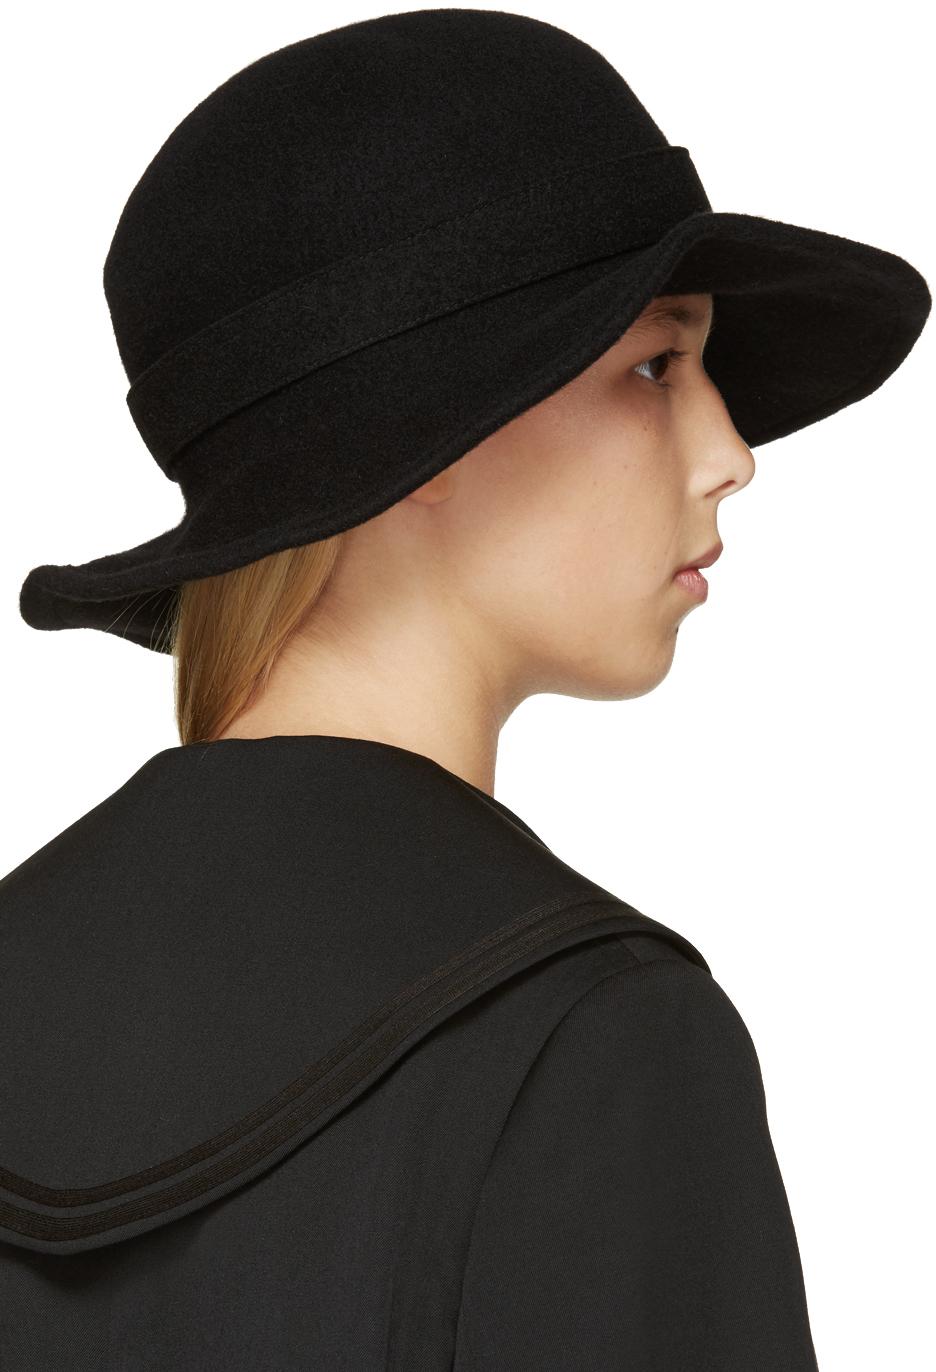 c458ad264 Comme des Garçons Black Wide Brim Wool Hat in Black - Lyst